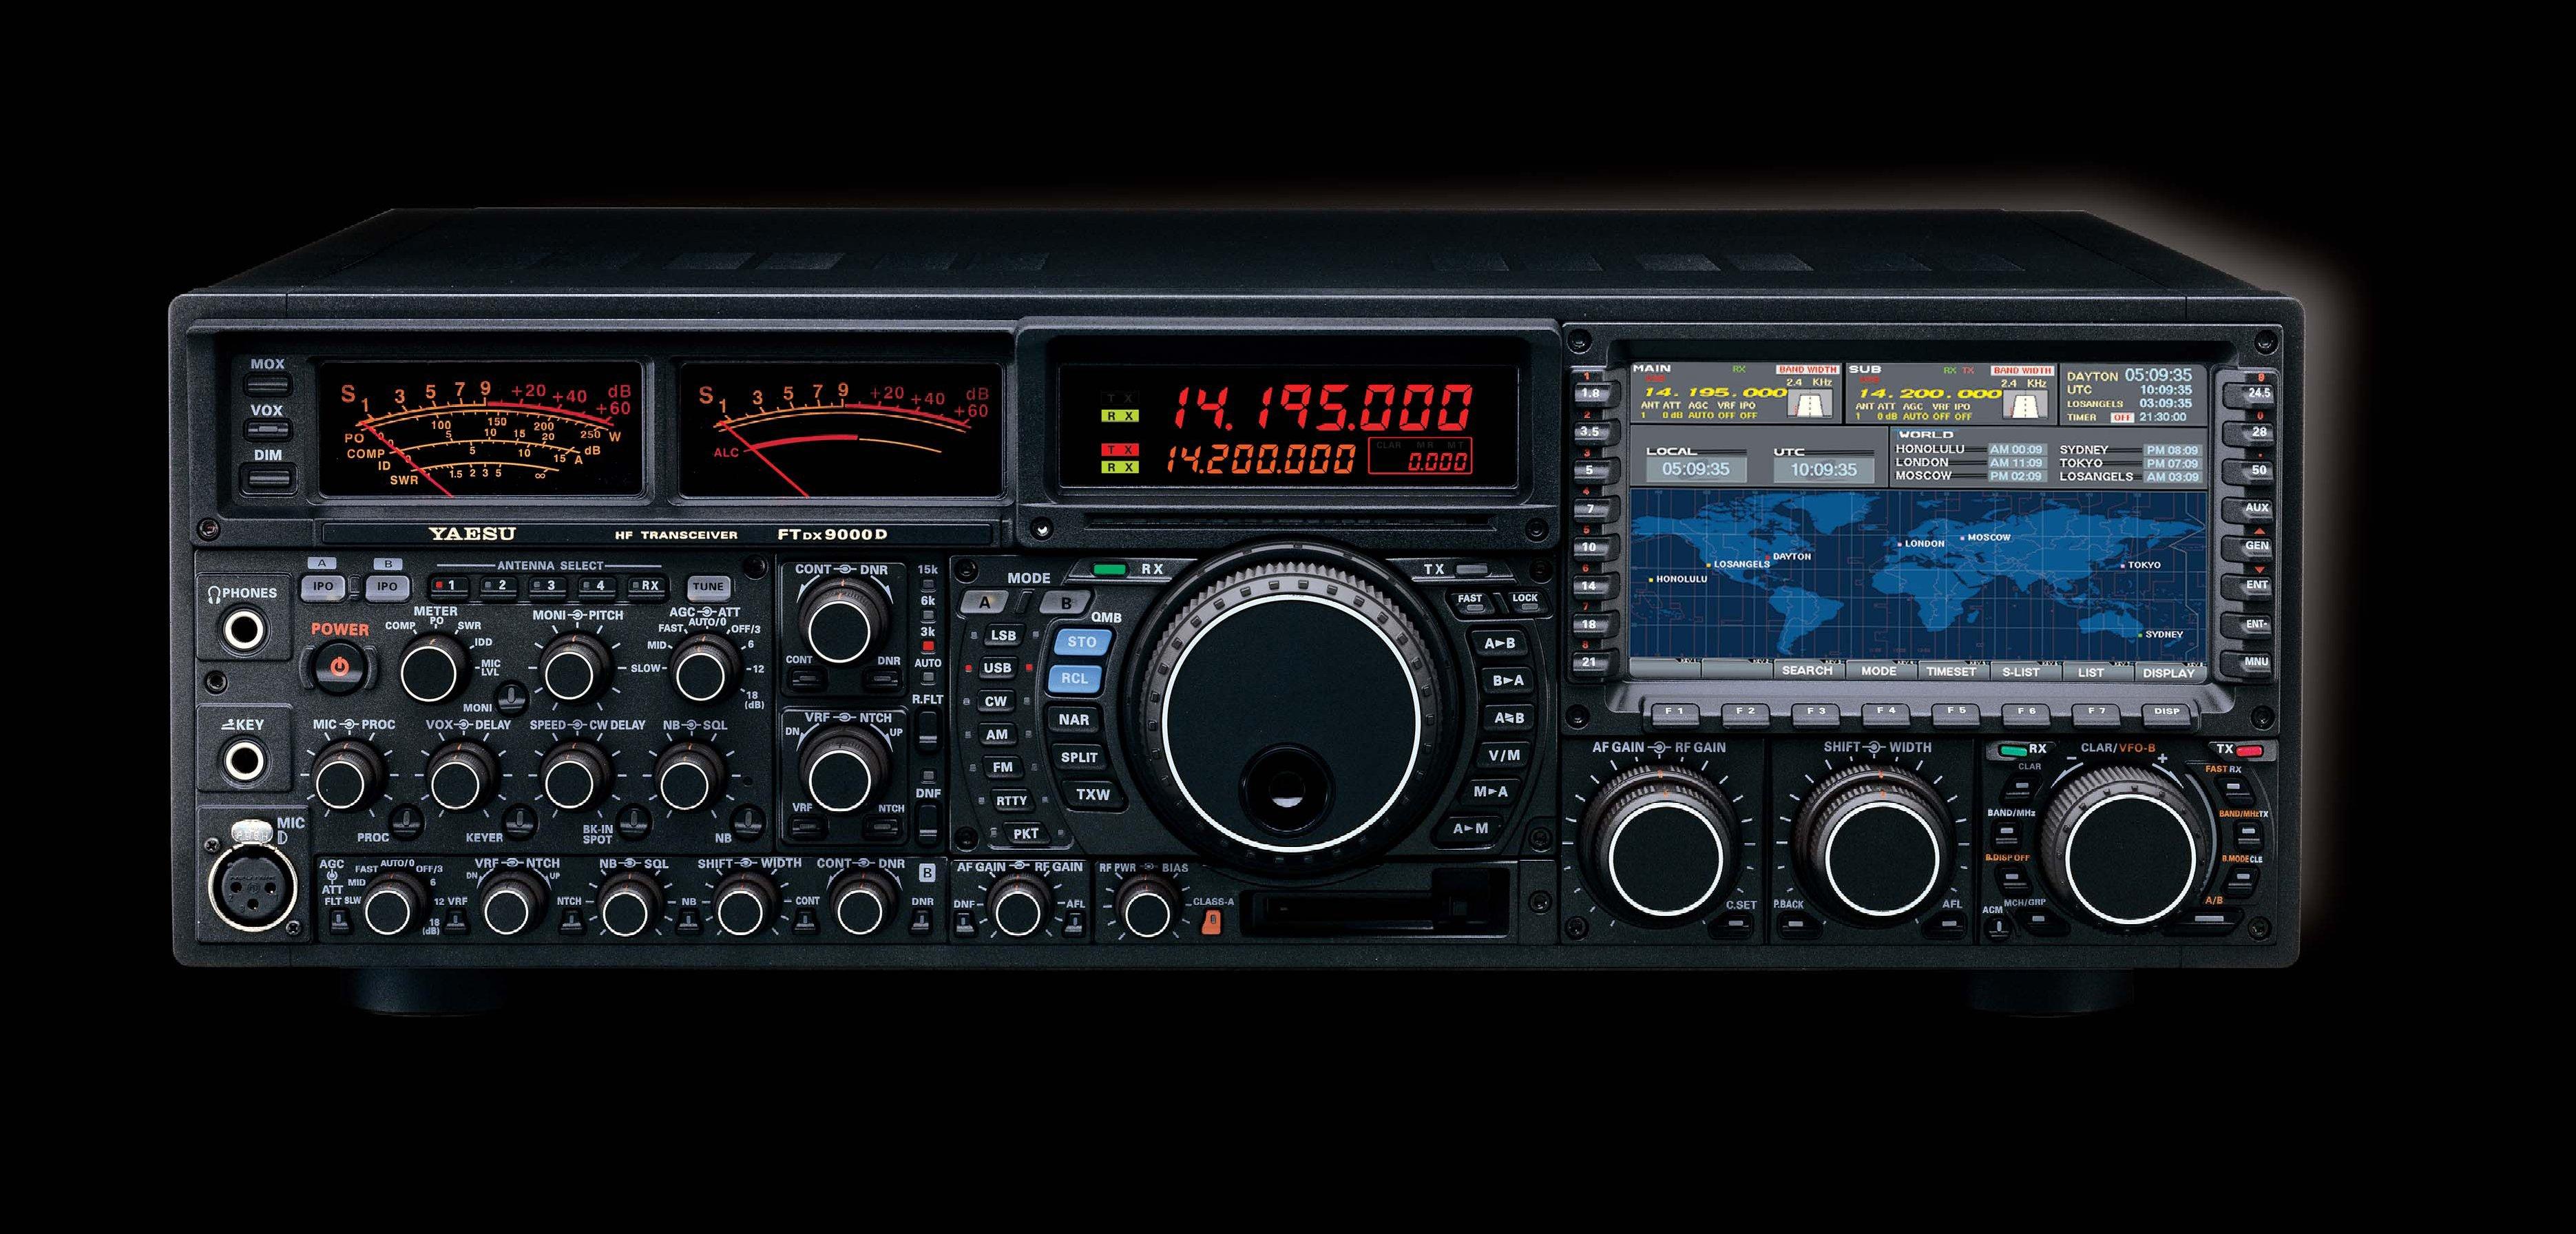 Ftdx 9000